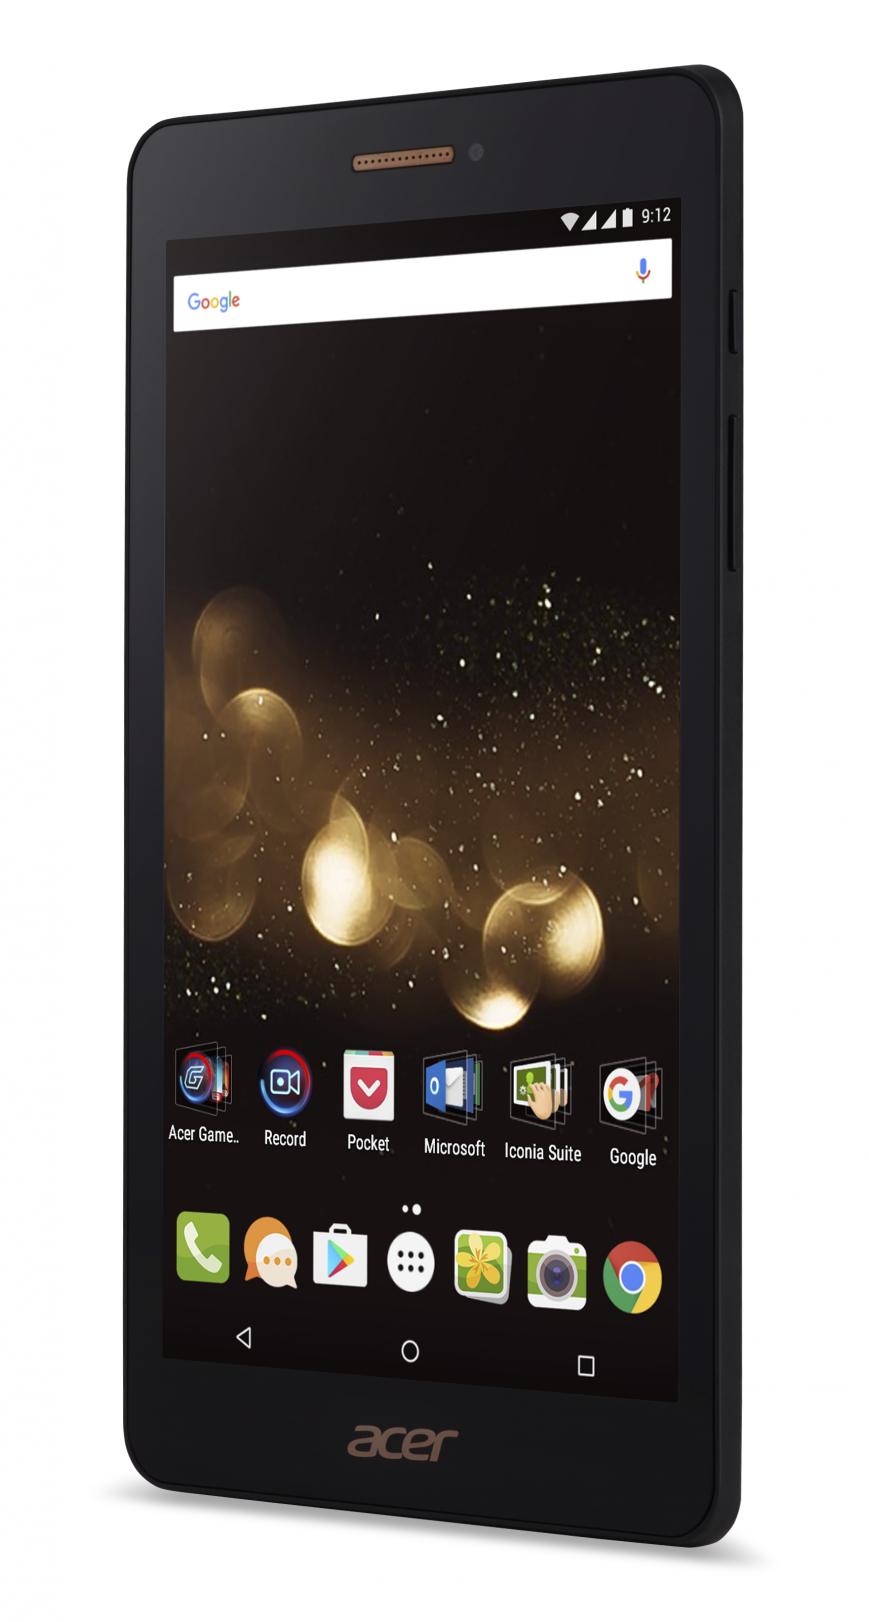 Acer Iconia Talk S-экран фото 1